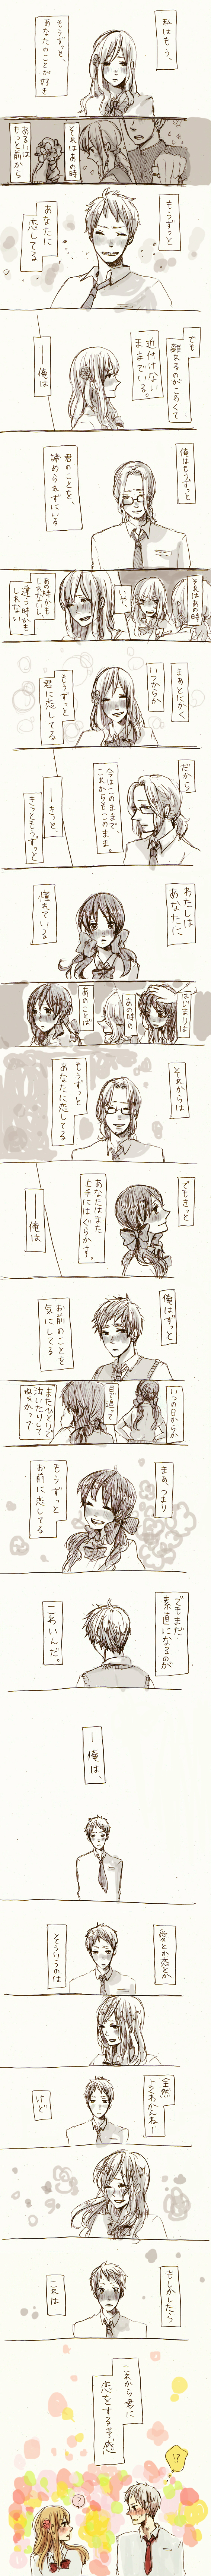 Tags: Anime, Yamamura, Axis Powers: Hetalia, Hungary, France, Seychelles, United Kingdom, Prussia, Gilbird, Pixiv, Gakuen Hetalia, Comic, Allied Forces